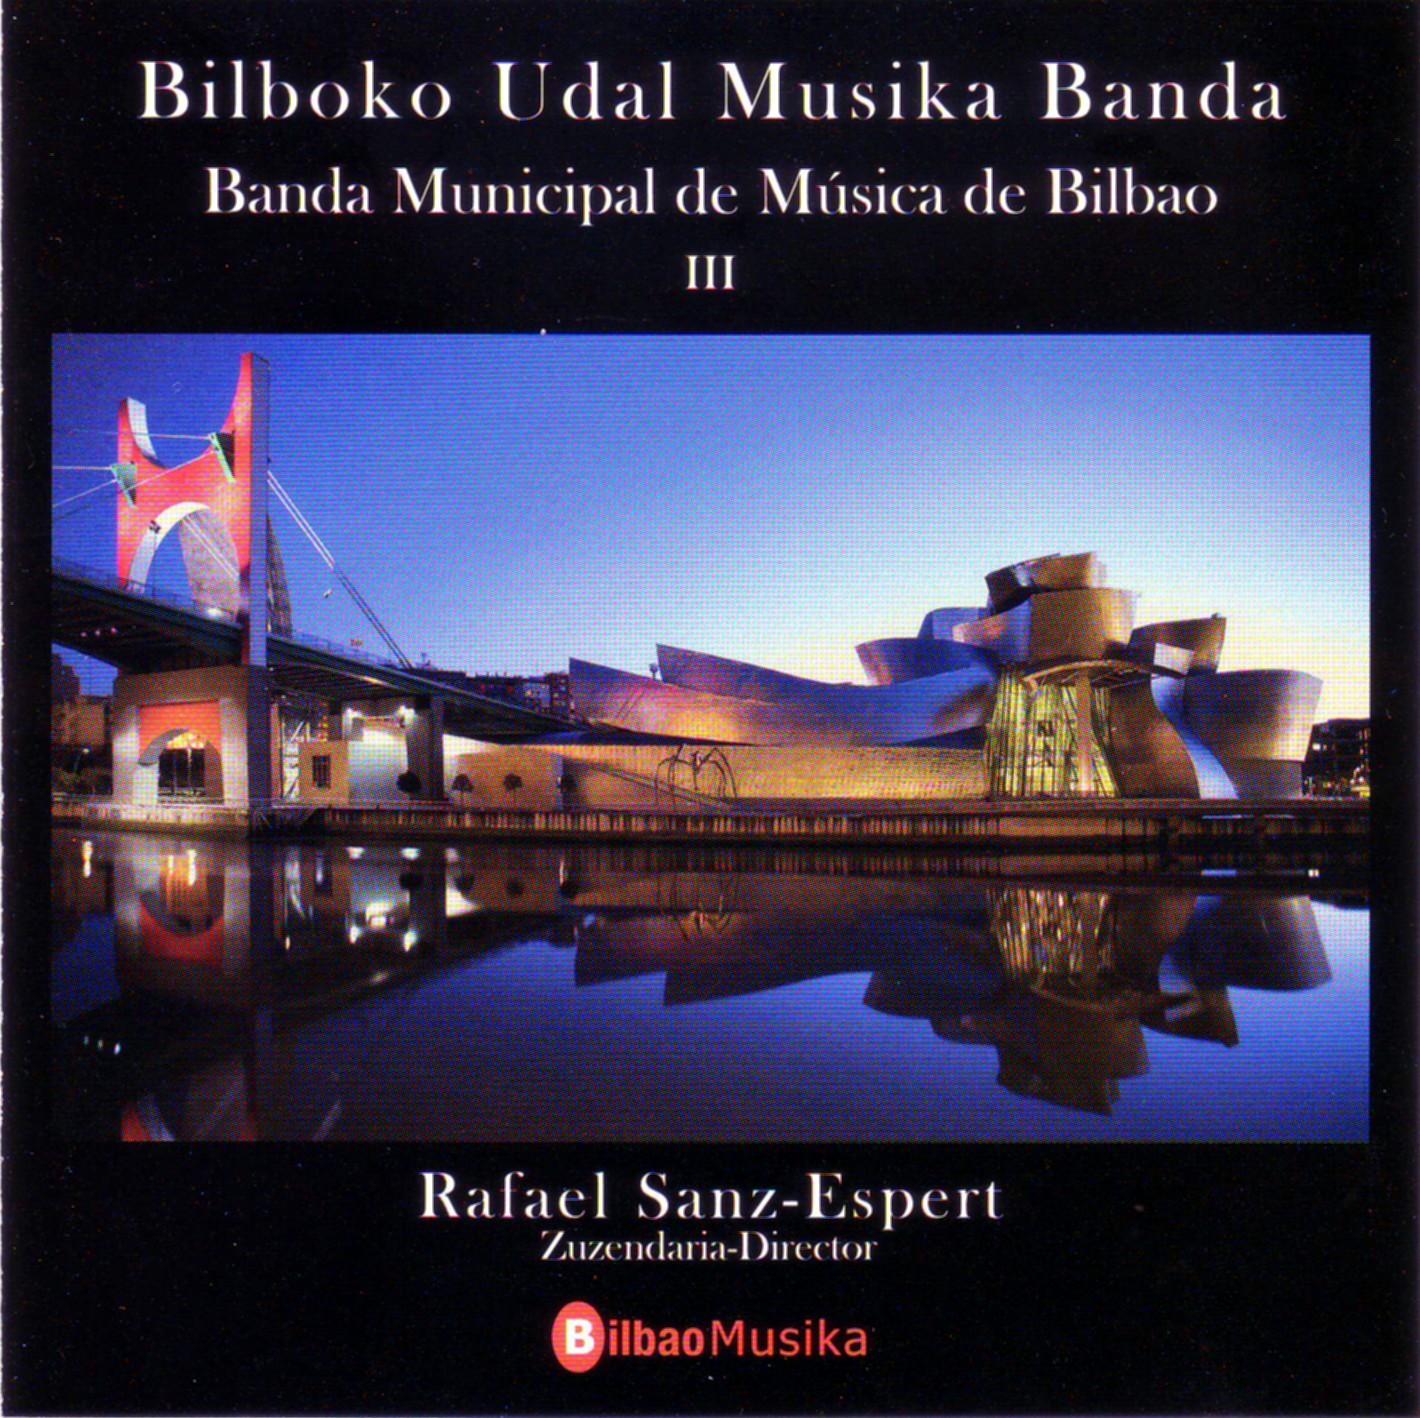 Bilboko Udal Musika Banda III